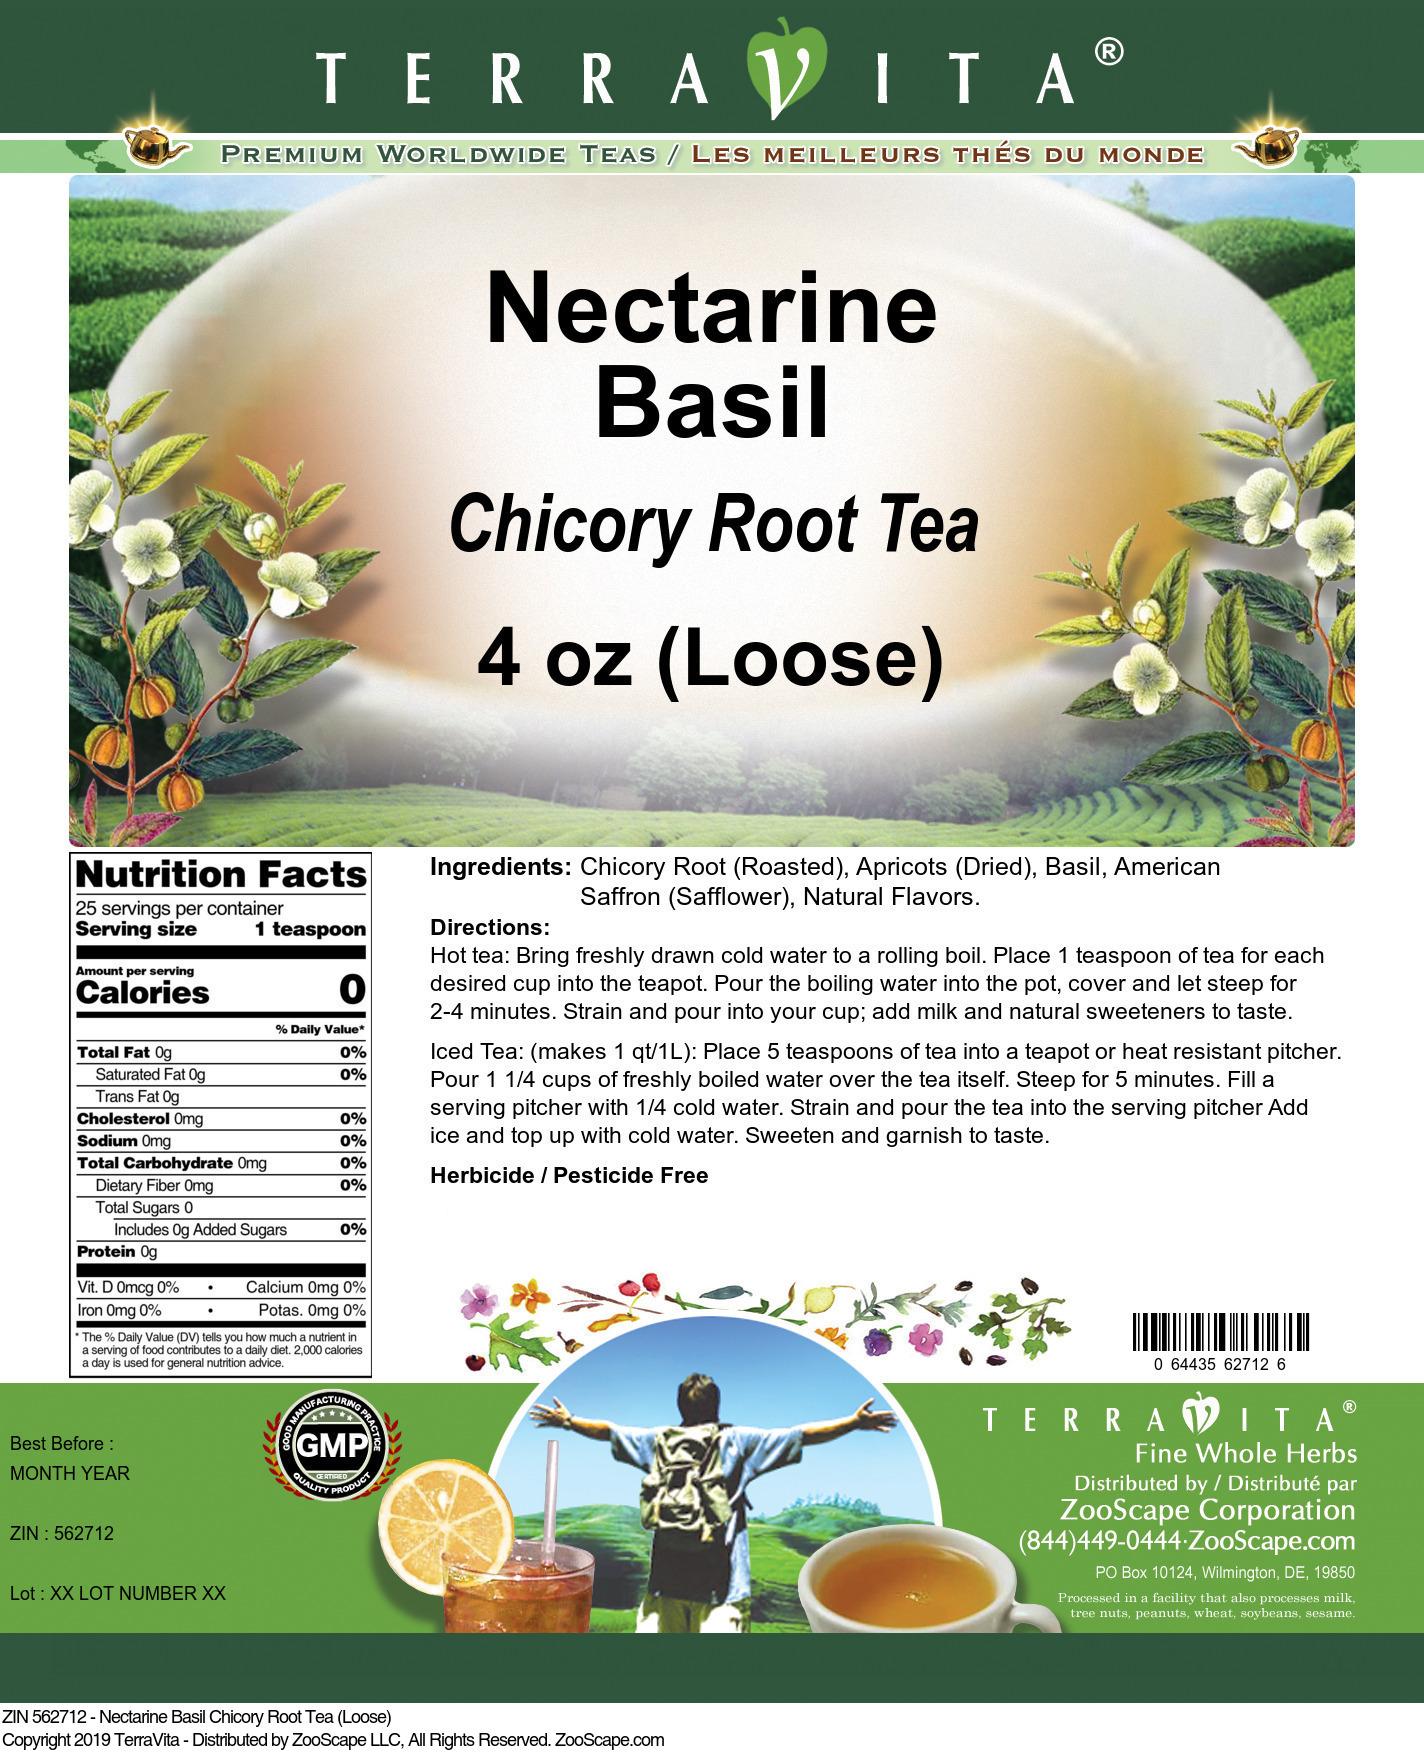 Nectarine Basil Chicory Root Tea (Loose)